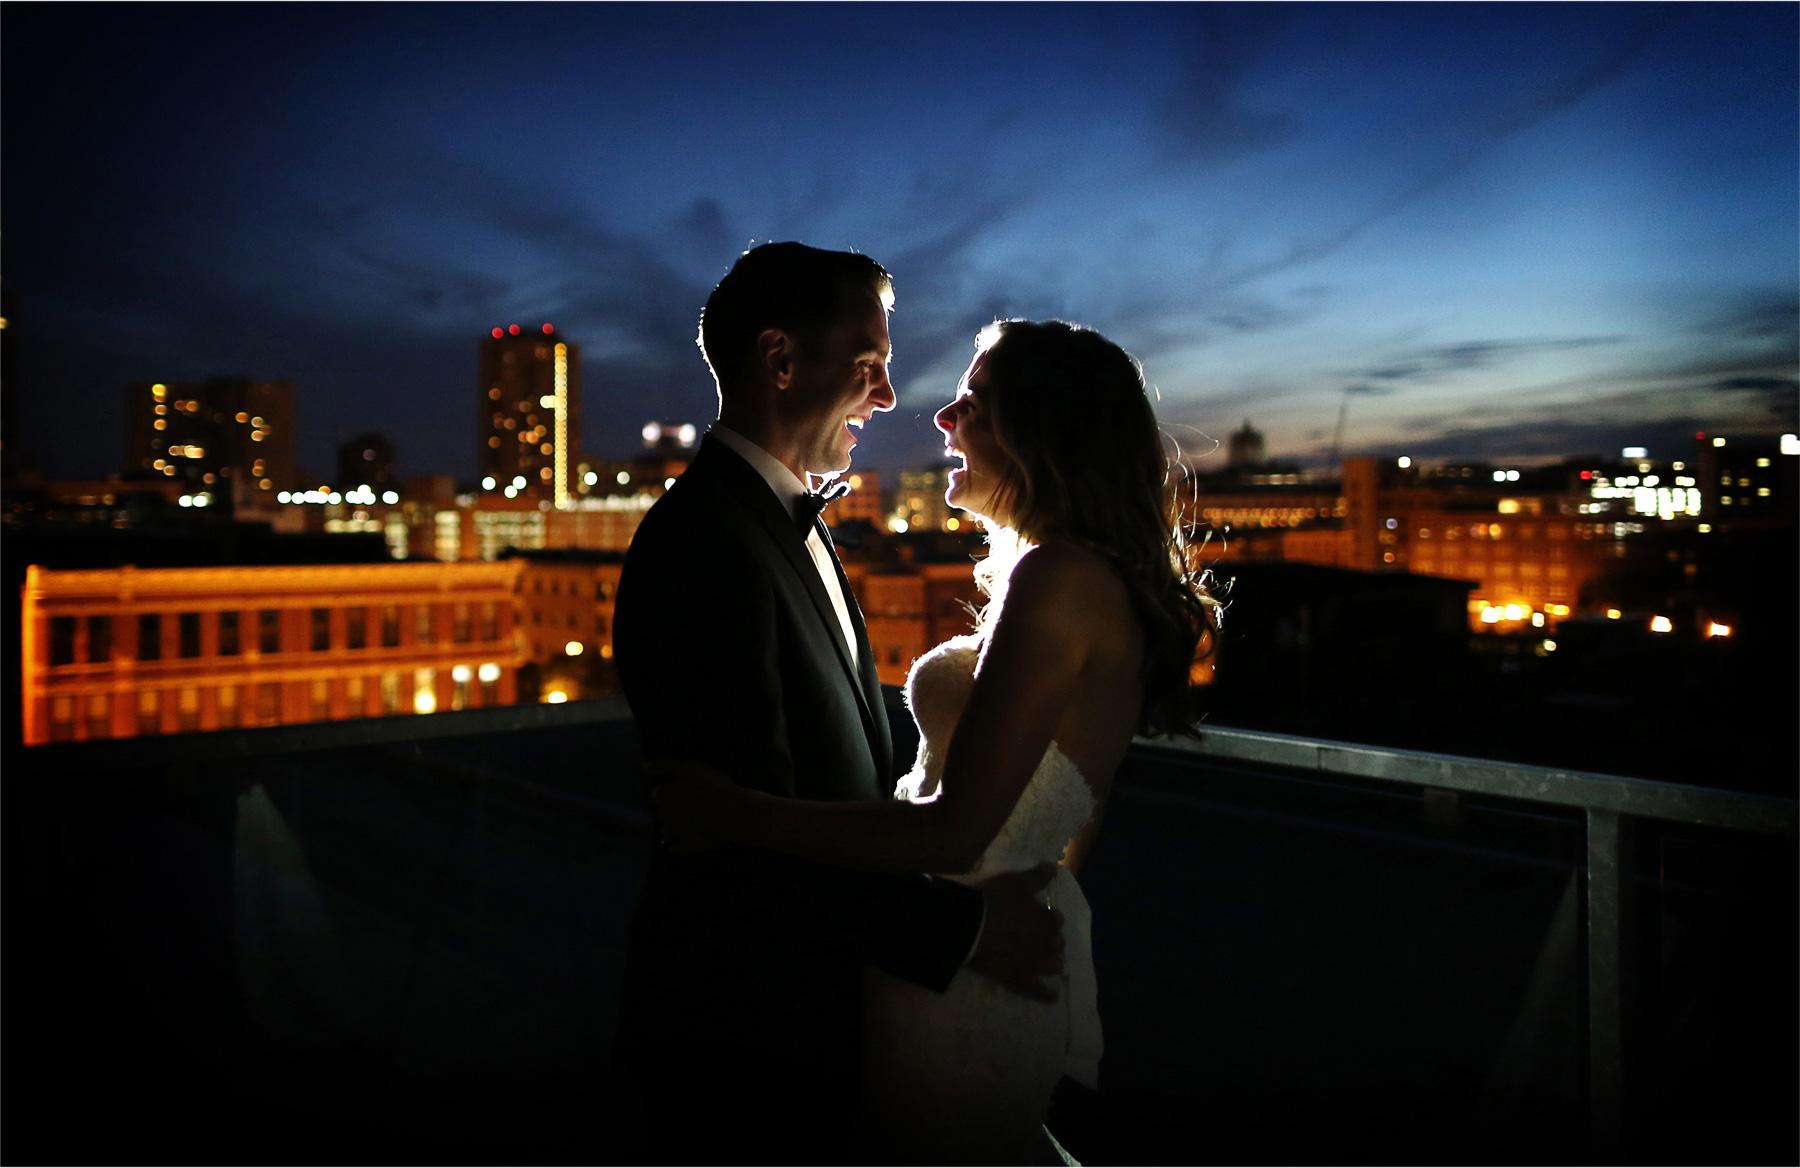 28-Saint-Paul-Minnesota-Wedding-Photographer-by-Andrew-Vick-Photography-Summer-Abulae-Bride-Groom-Laughter-Night-Molly-and-Dan.jpg